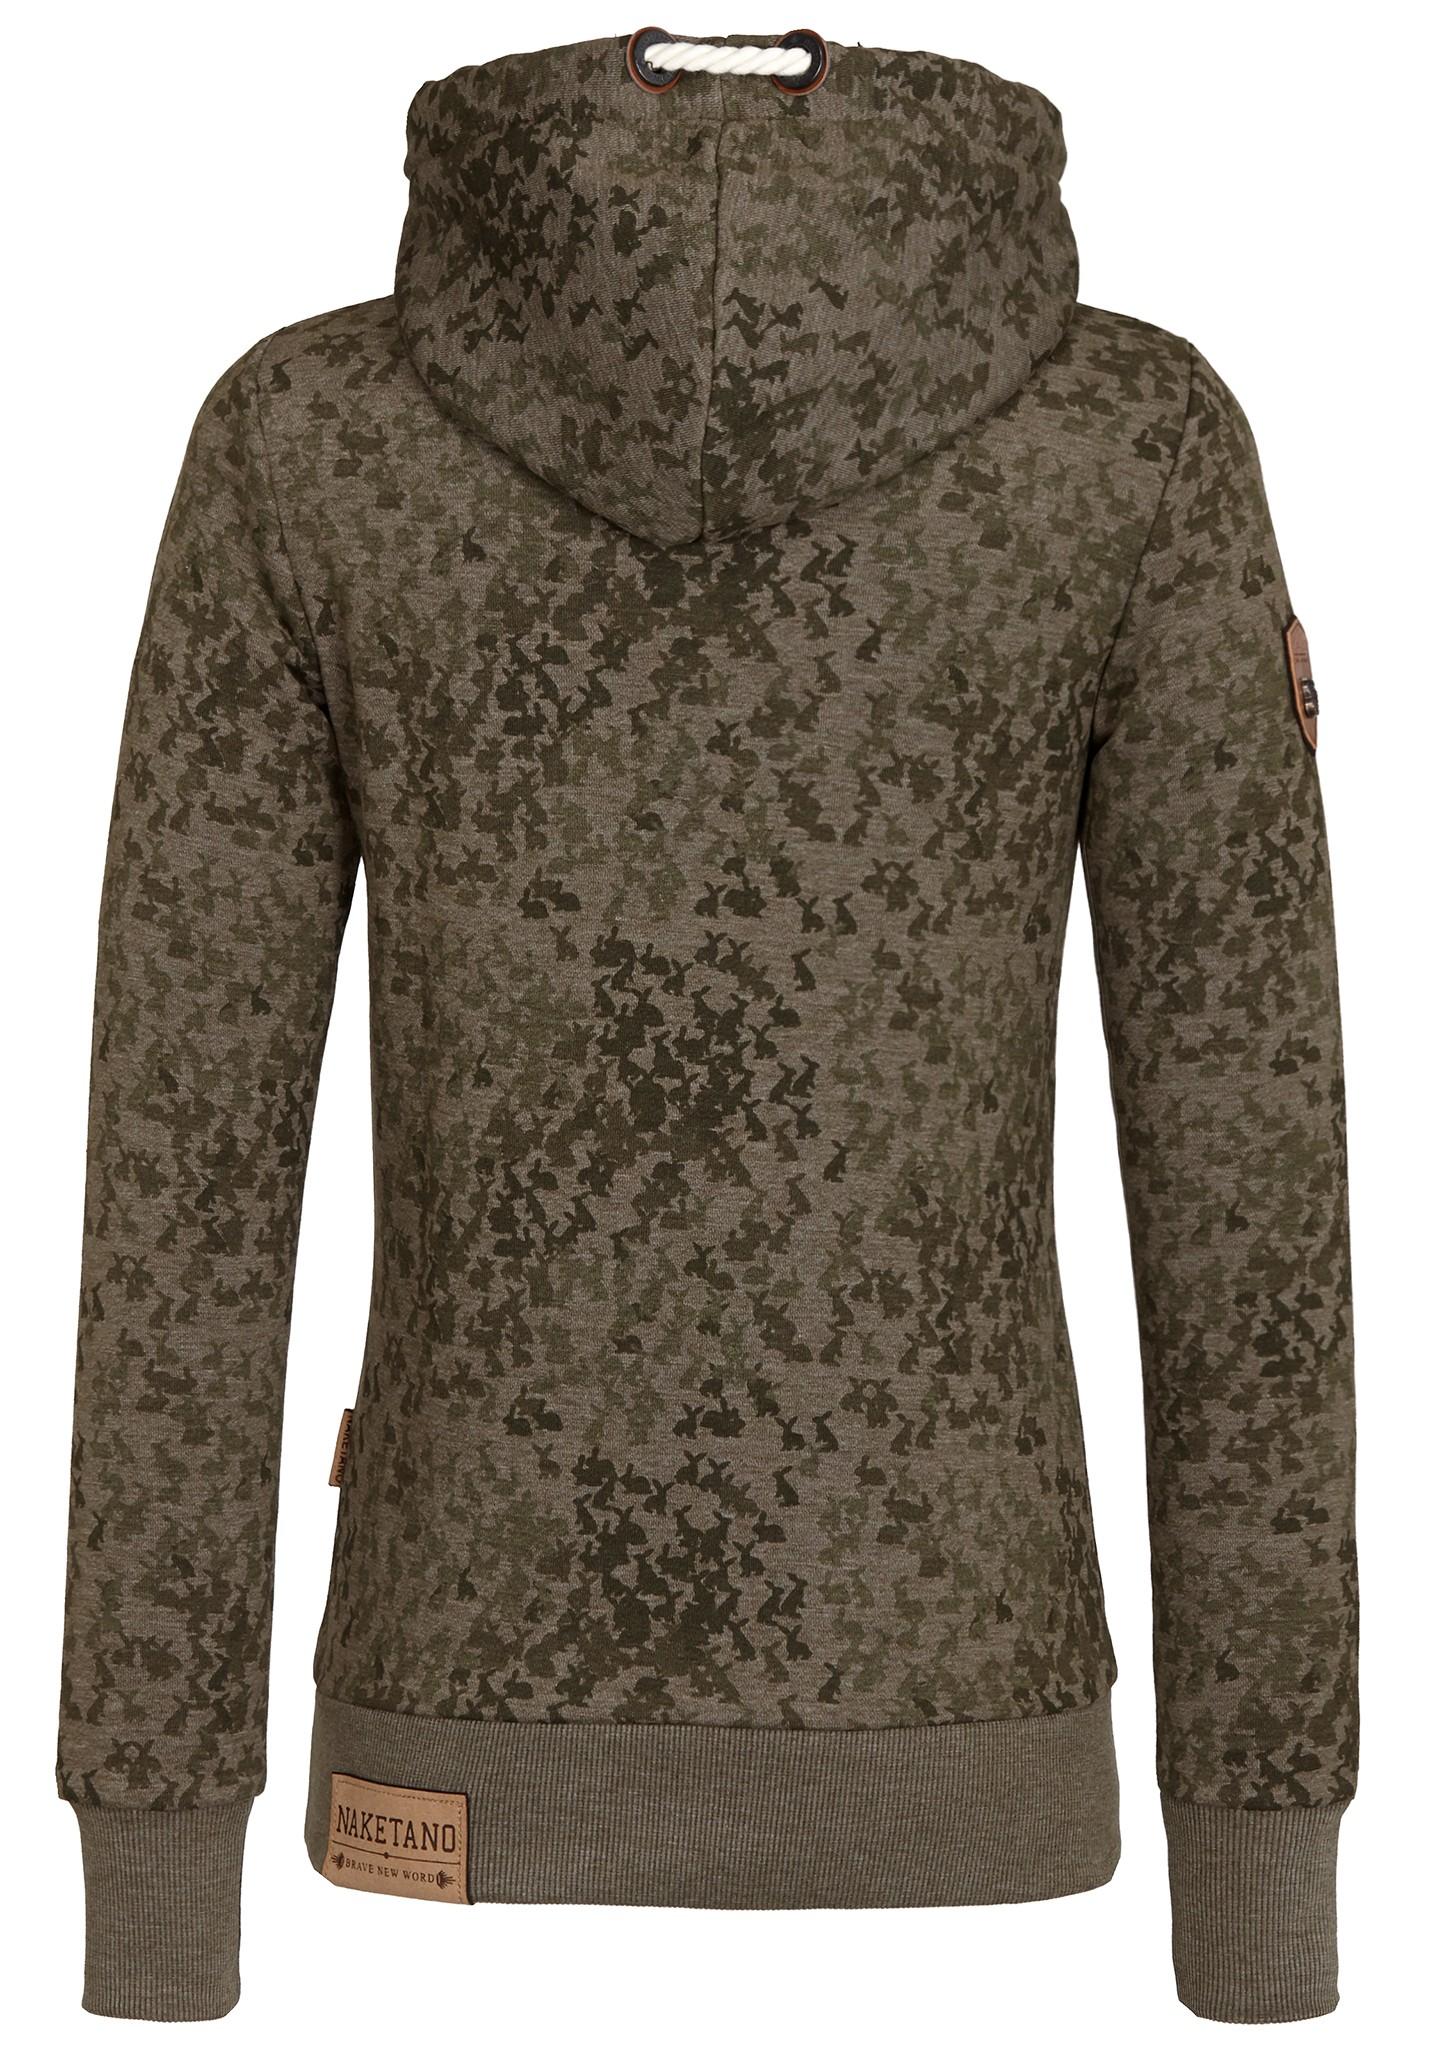 neu naketano darth hase ii damen kapuzenpullover pullover hoodie kapuzenjacke ebay. Black Bedroom Furniture Sets. Home Design Ideas